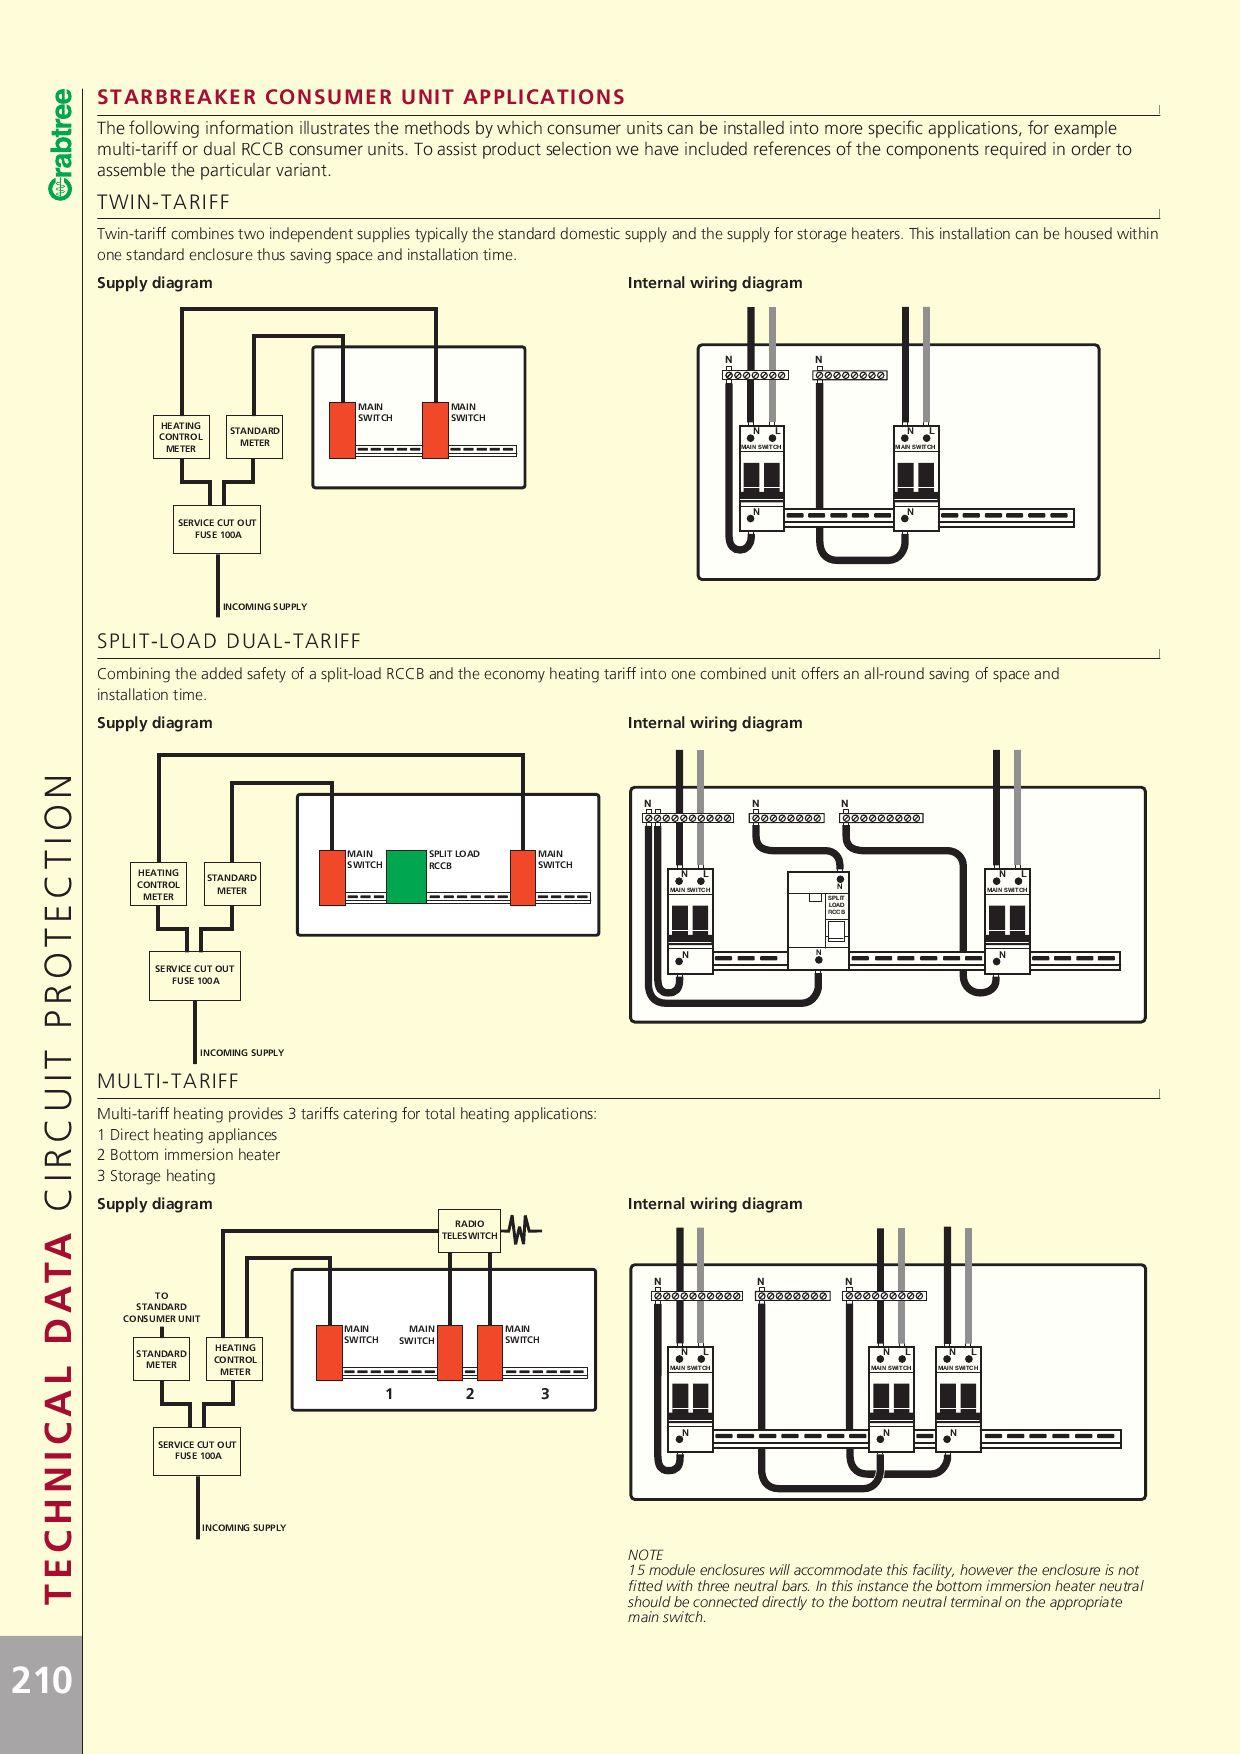 Http Bizflipscom Library Pdf Electrium Crabtree20071 By Storage Heater Wiring Diagram Brochures Uk Ltd Issuu